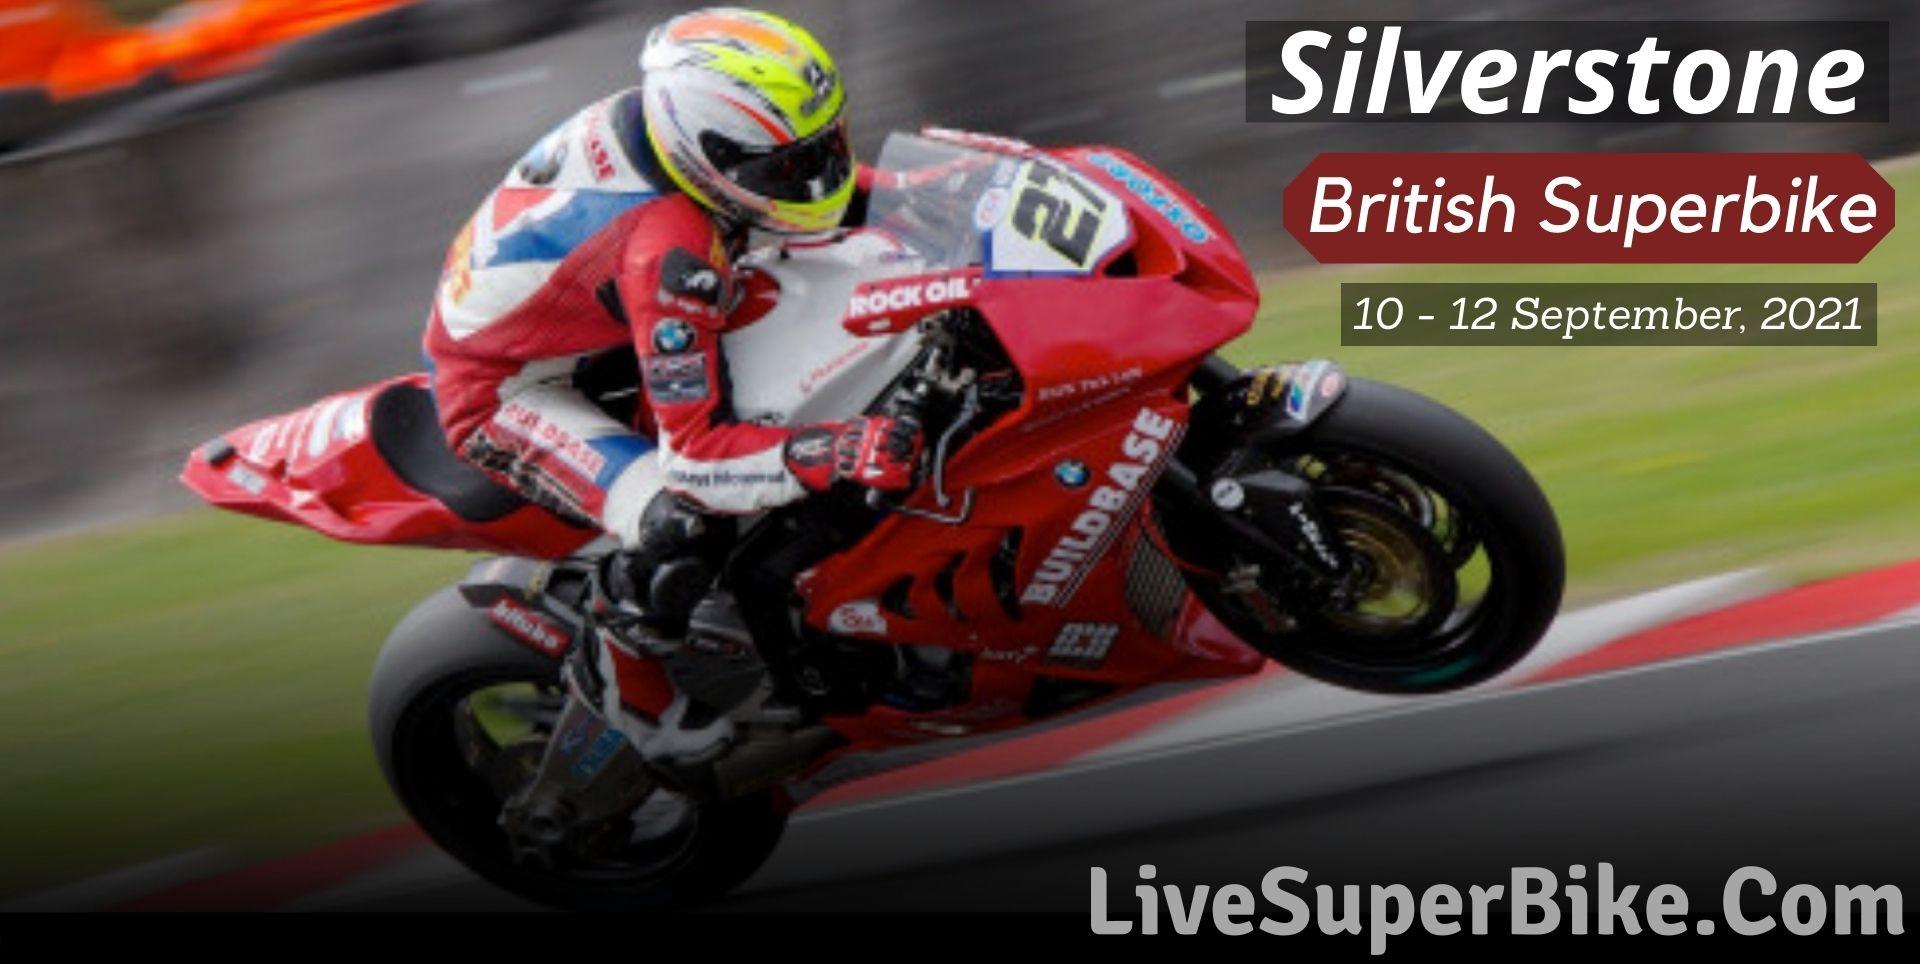 Silverstone British Superbike Live Stream 2021